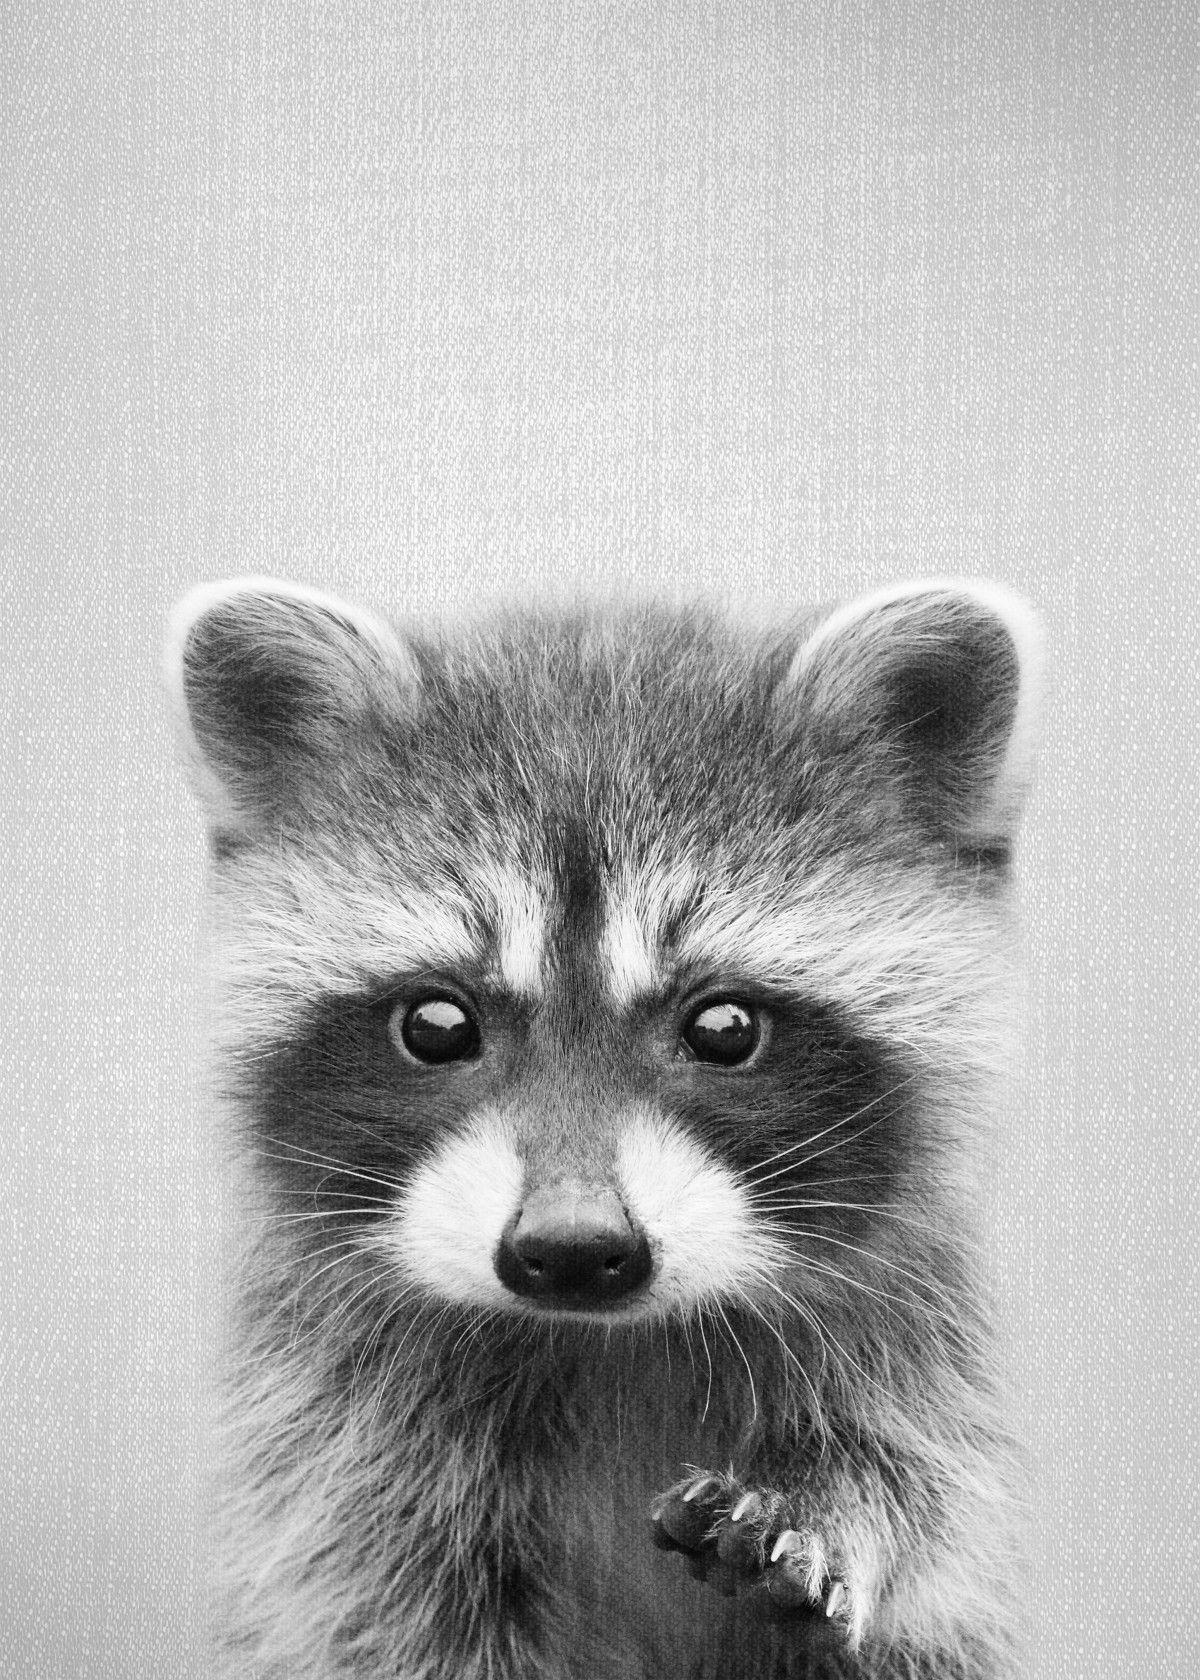 Raccoon BW Nature Poster Print metal posters Displate